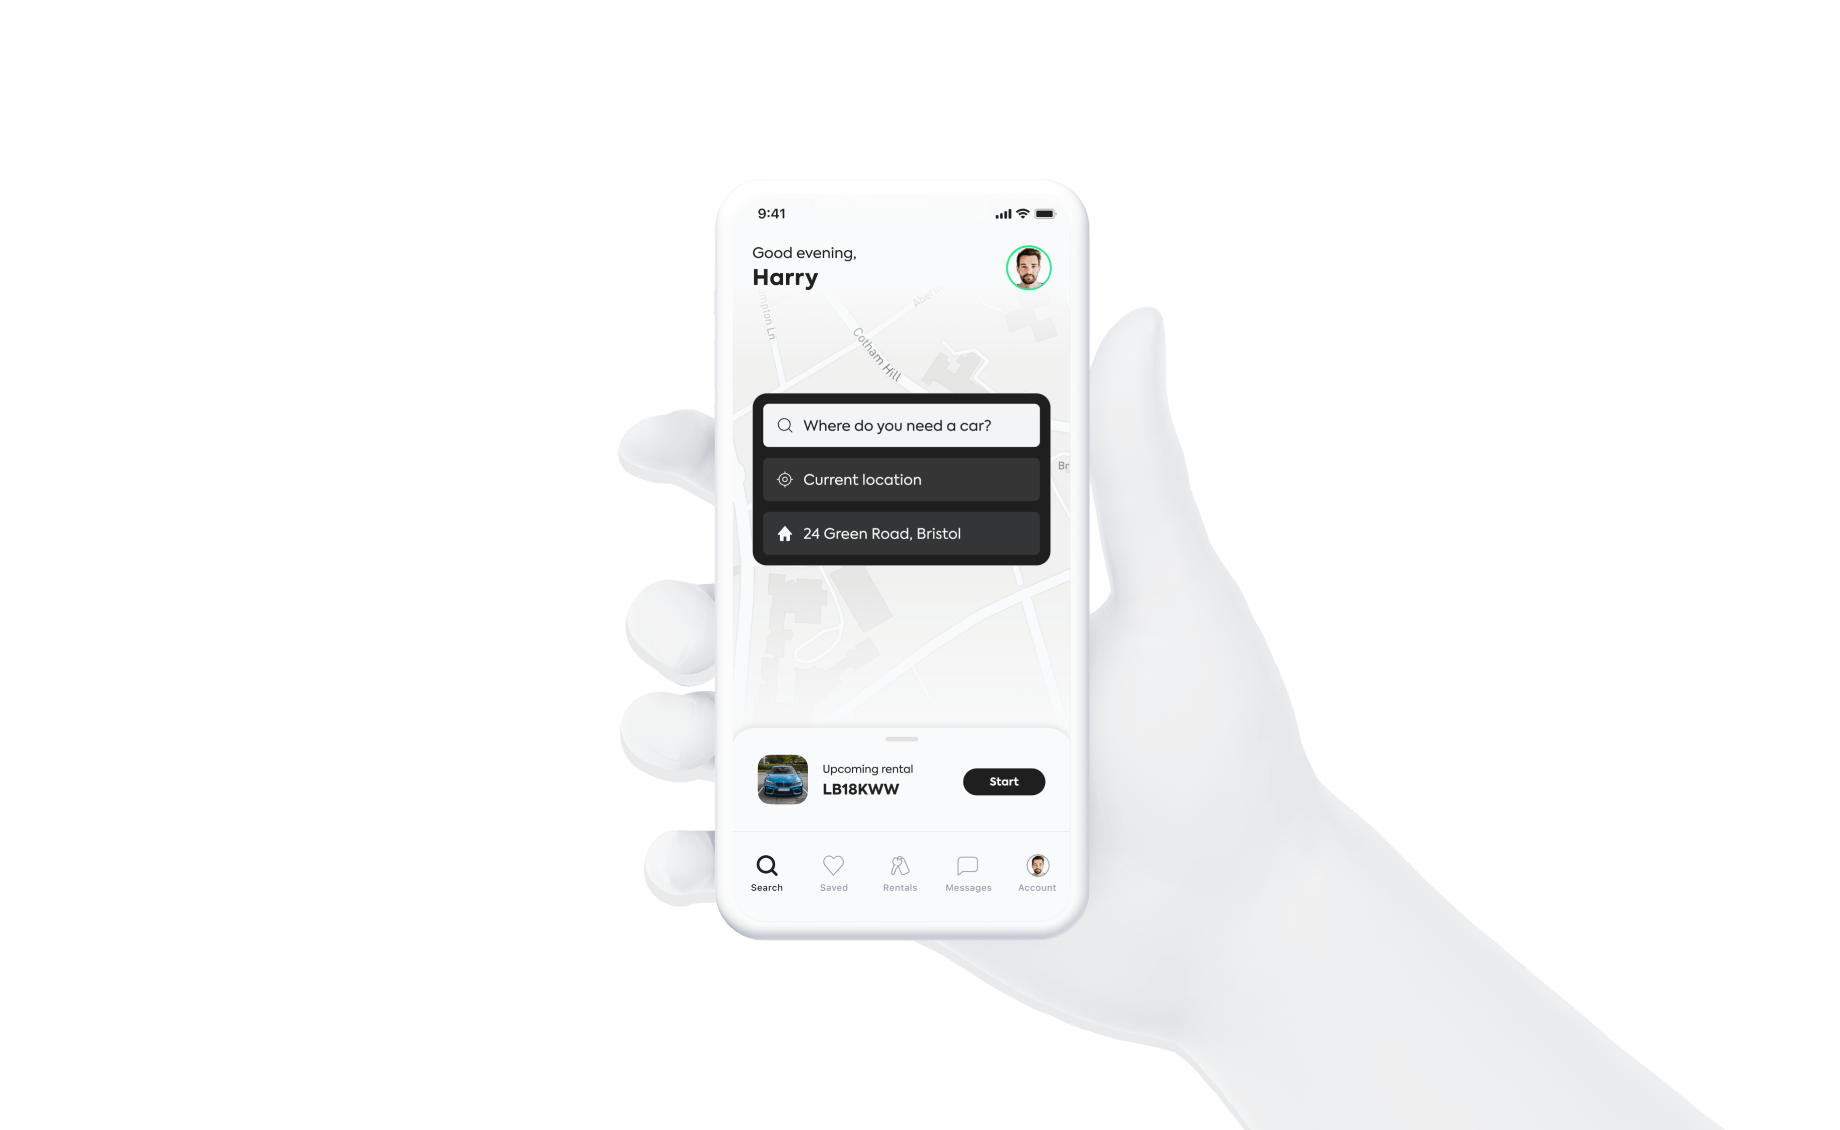 Karshare a peer-to-peer car sharing app for car rentals and car sharing